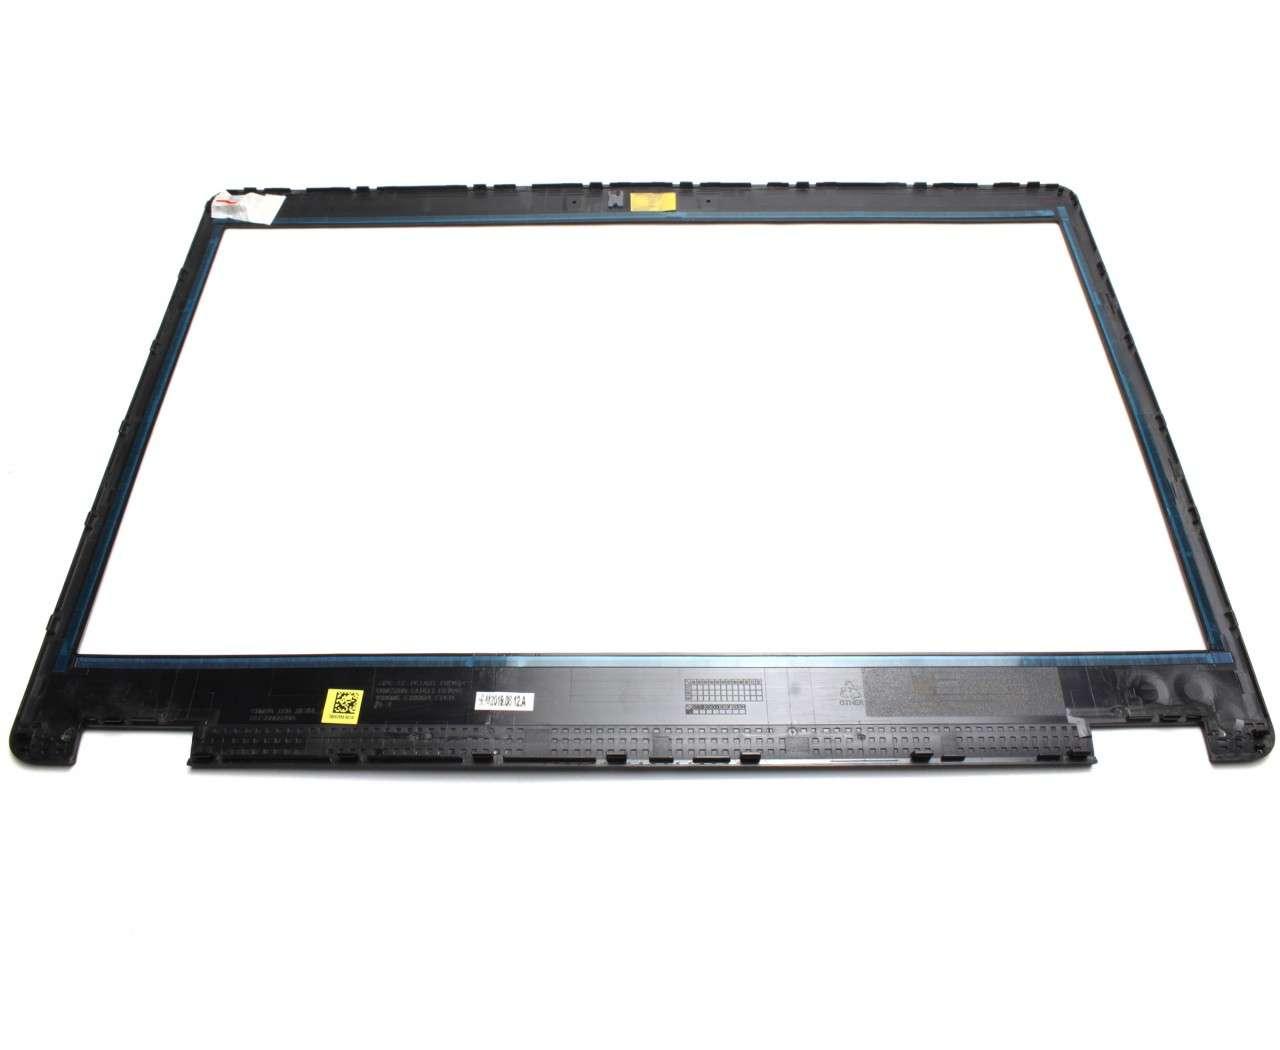 Rama Display Dell Latitude E7450 Bezel Front Cover Neagra imagine powerlaptop.ro 2021